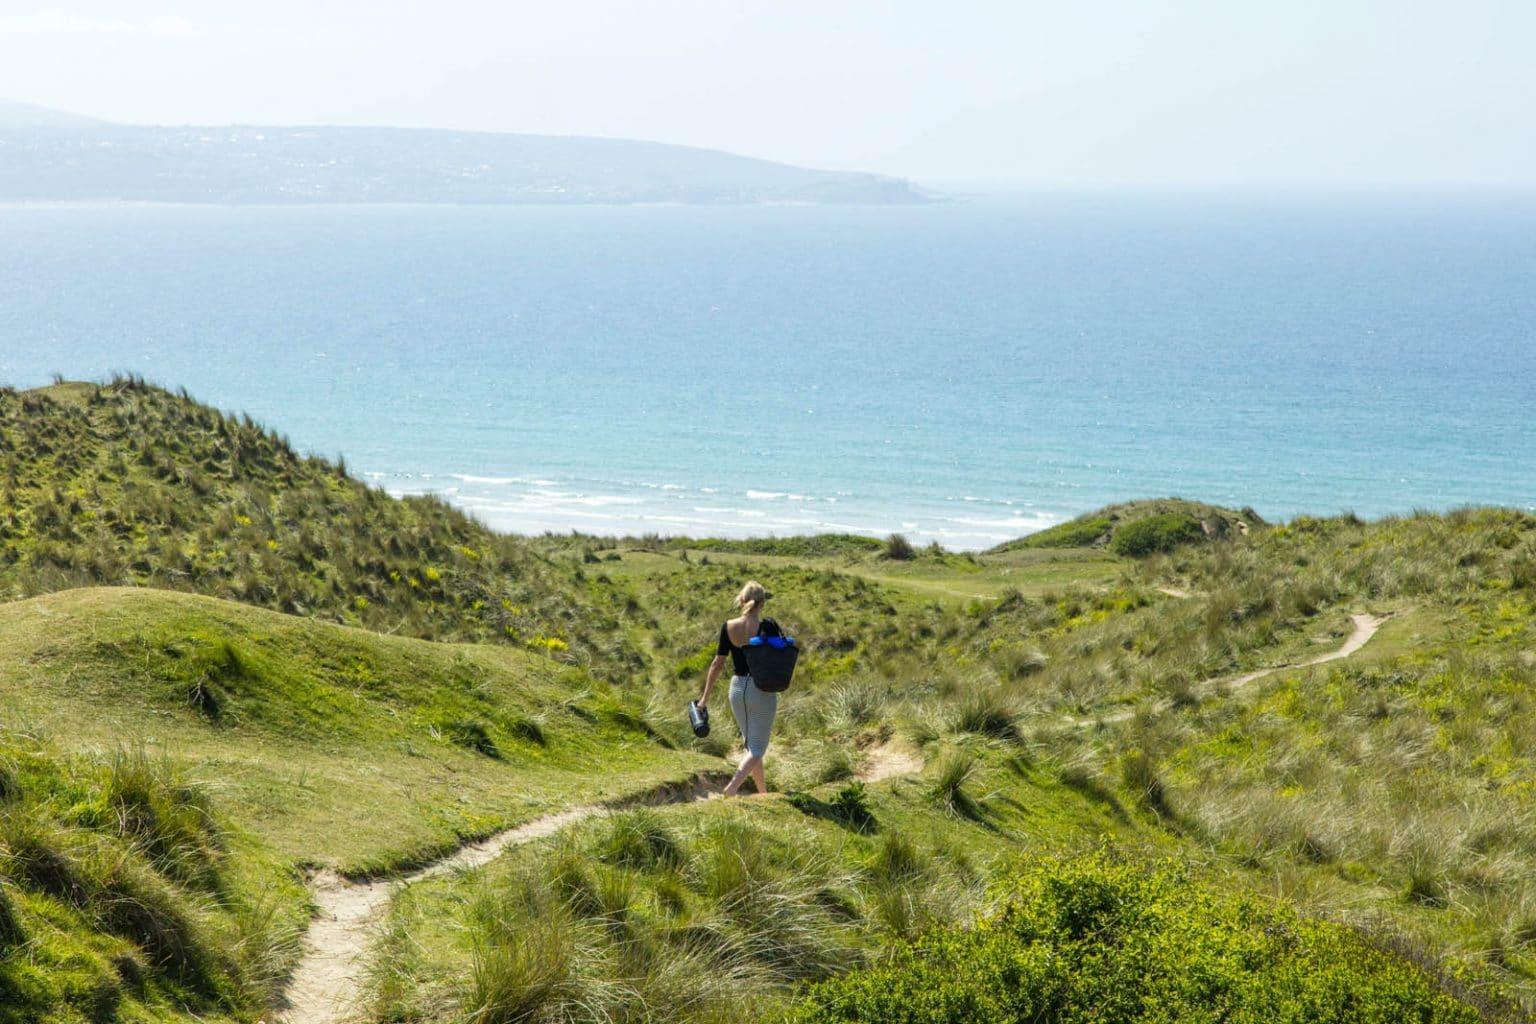 Walking the coast path